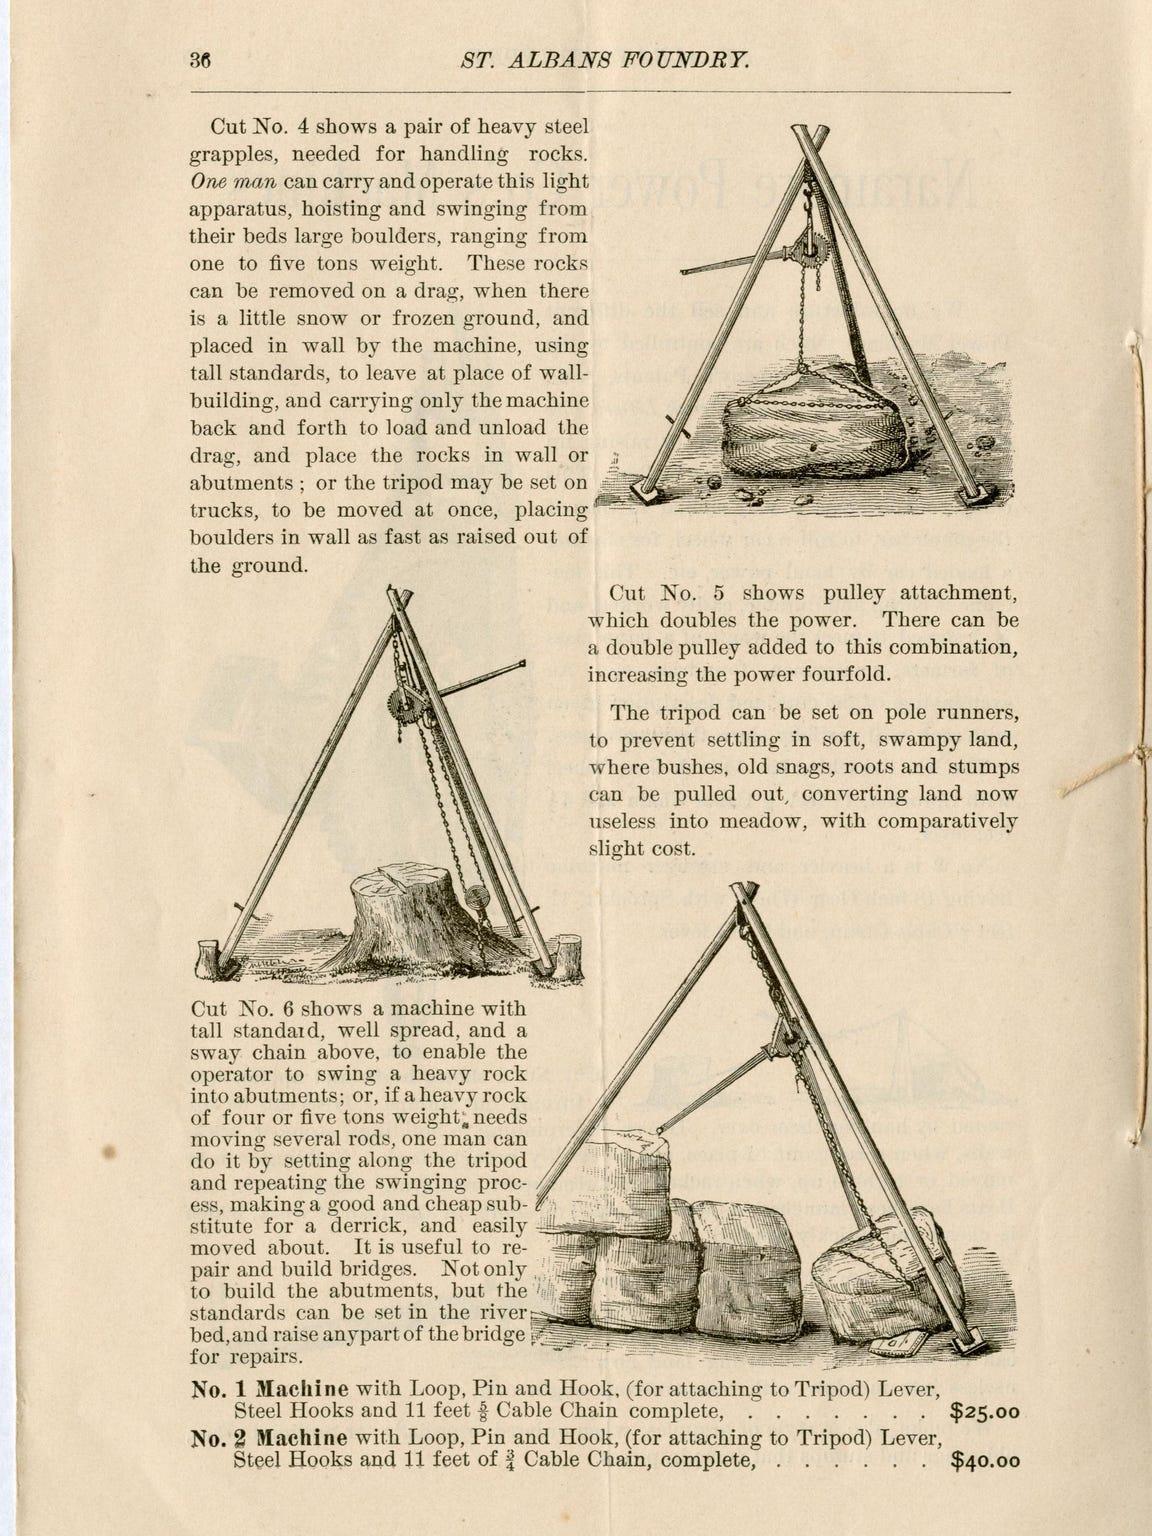 1885 St. Albans Foundry catalog